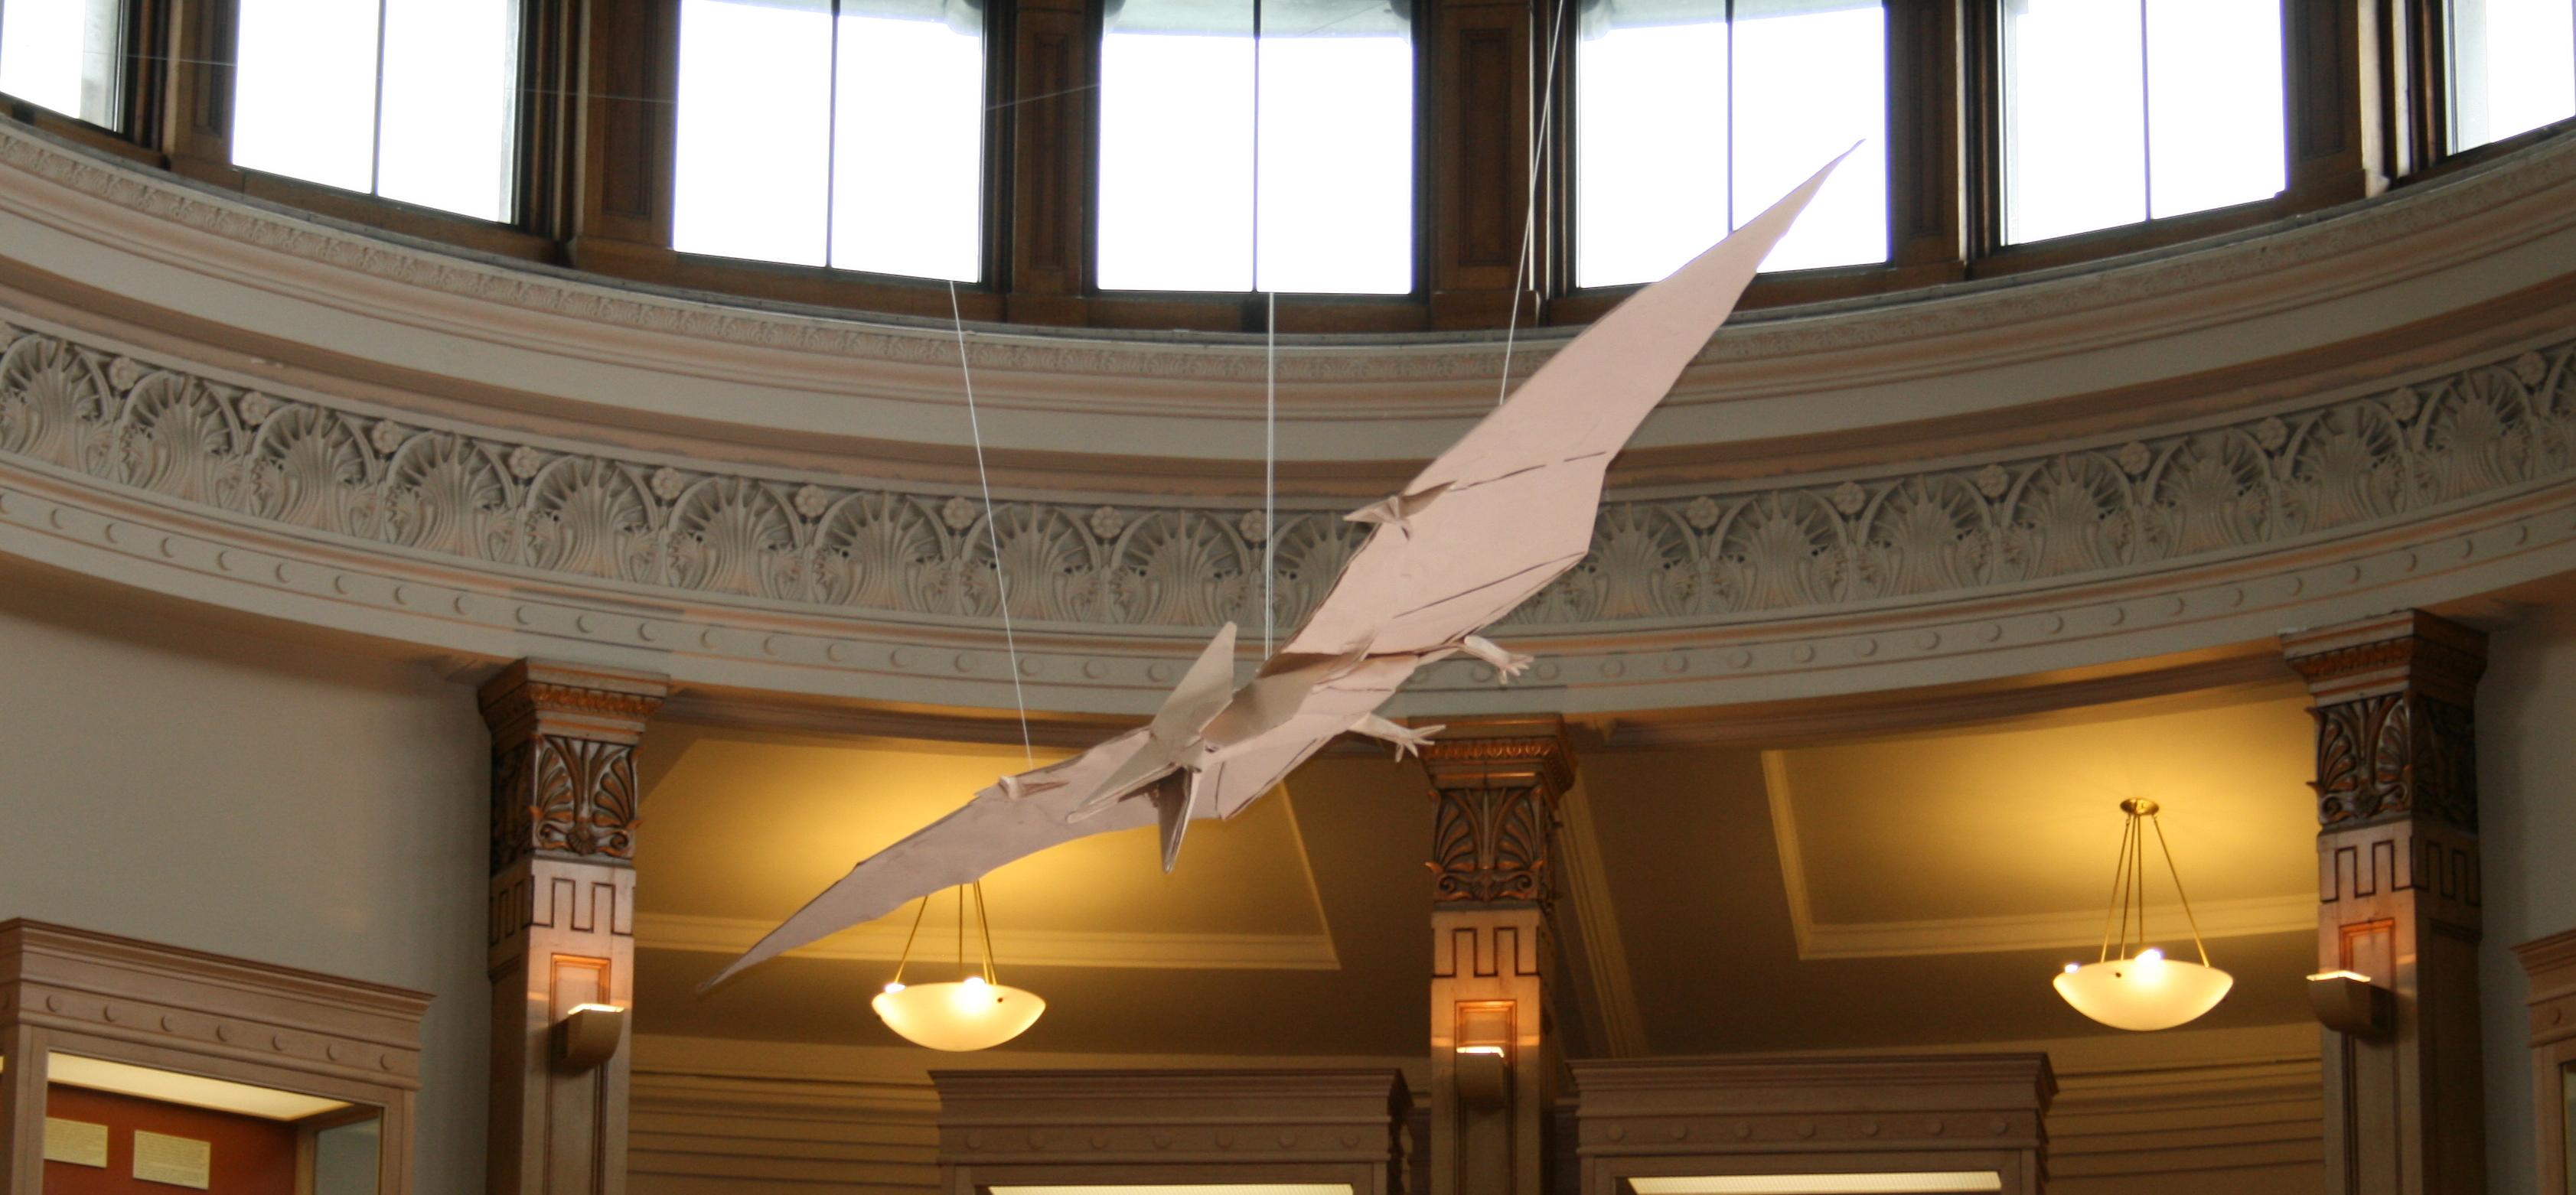 monumental_pteranodon.jpg